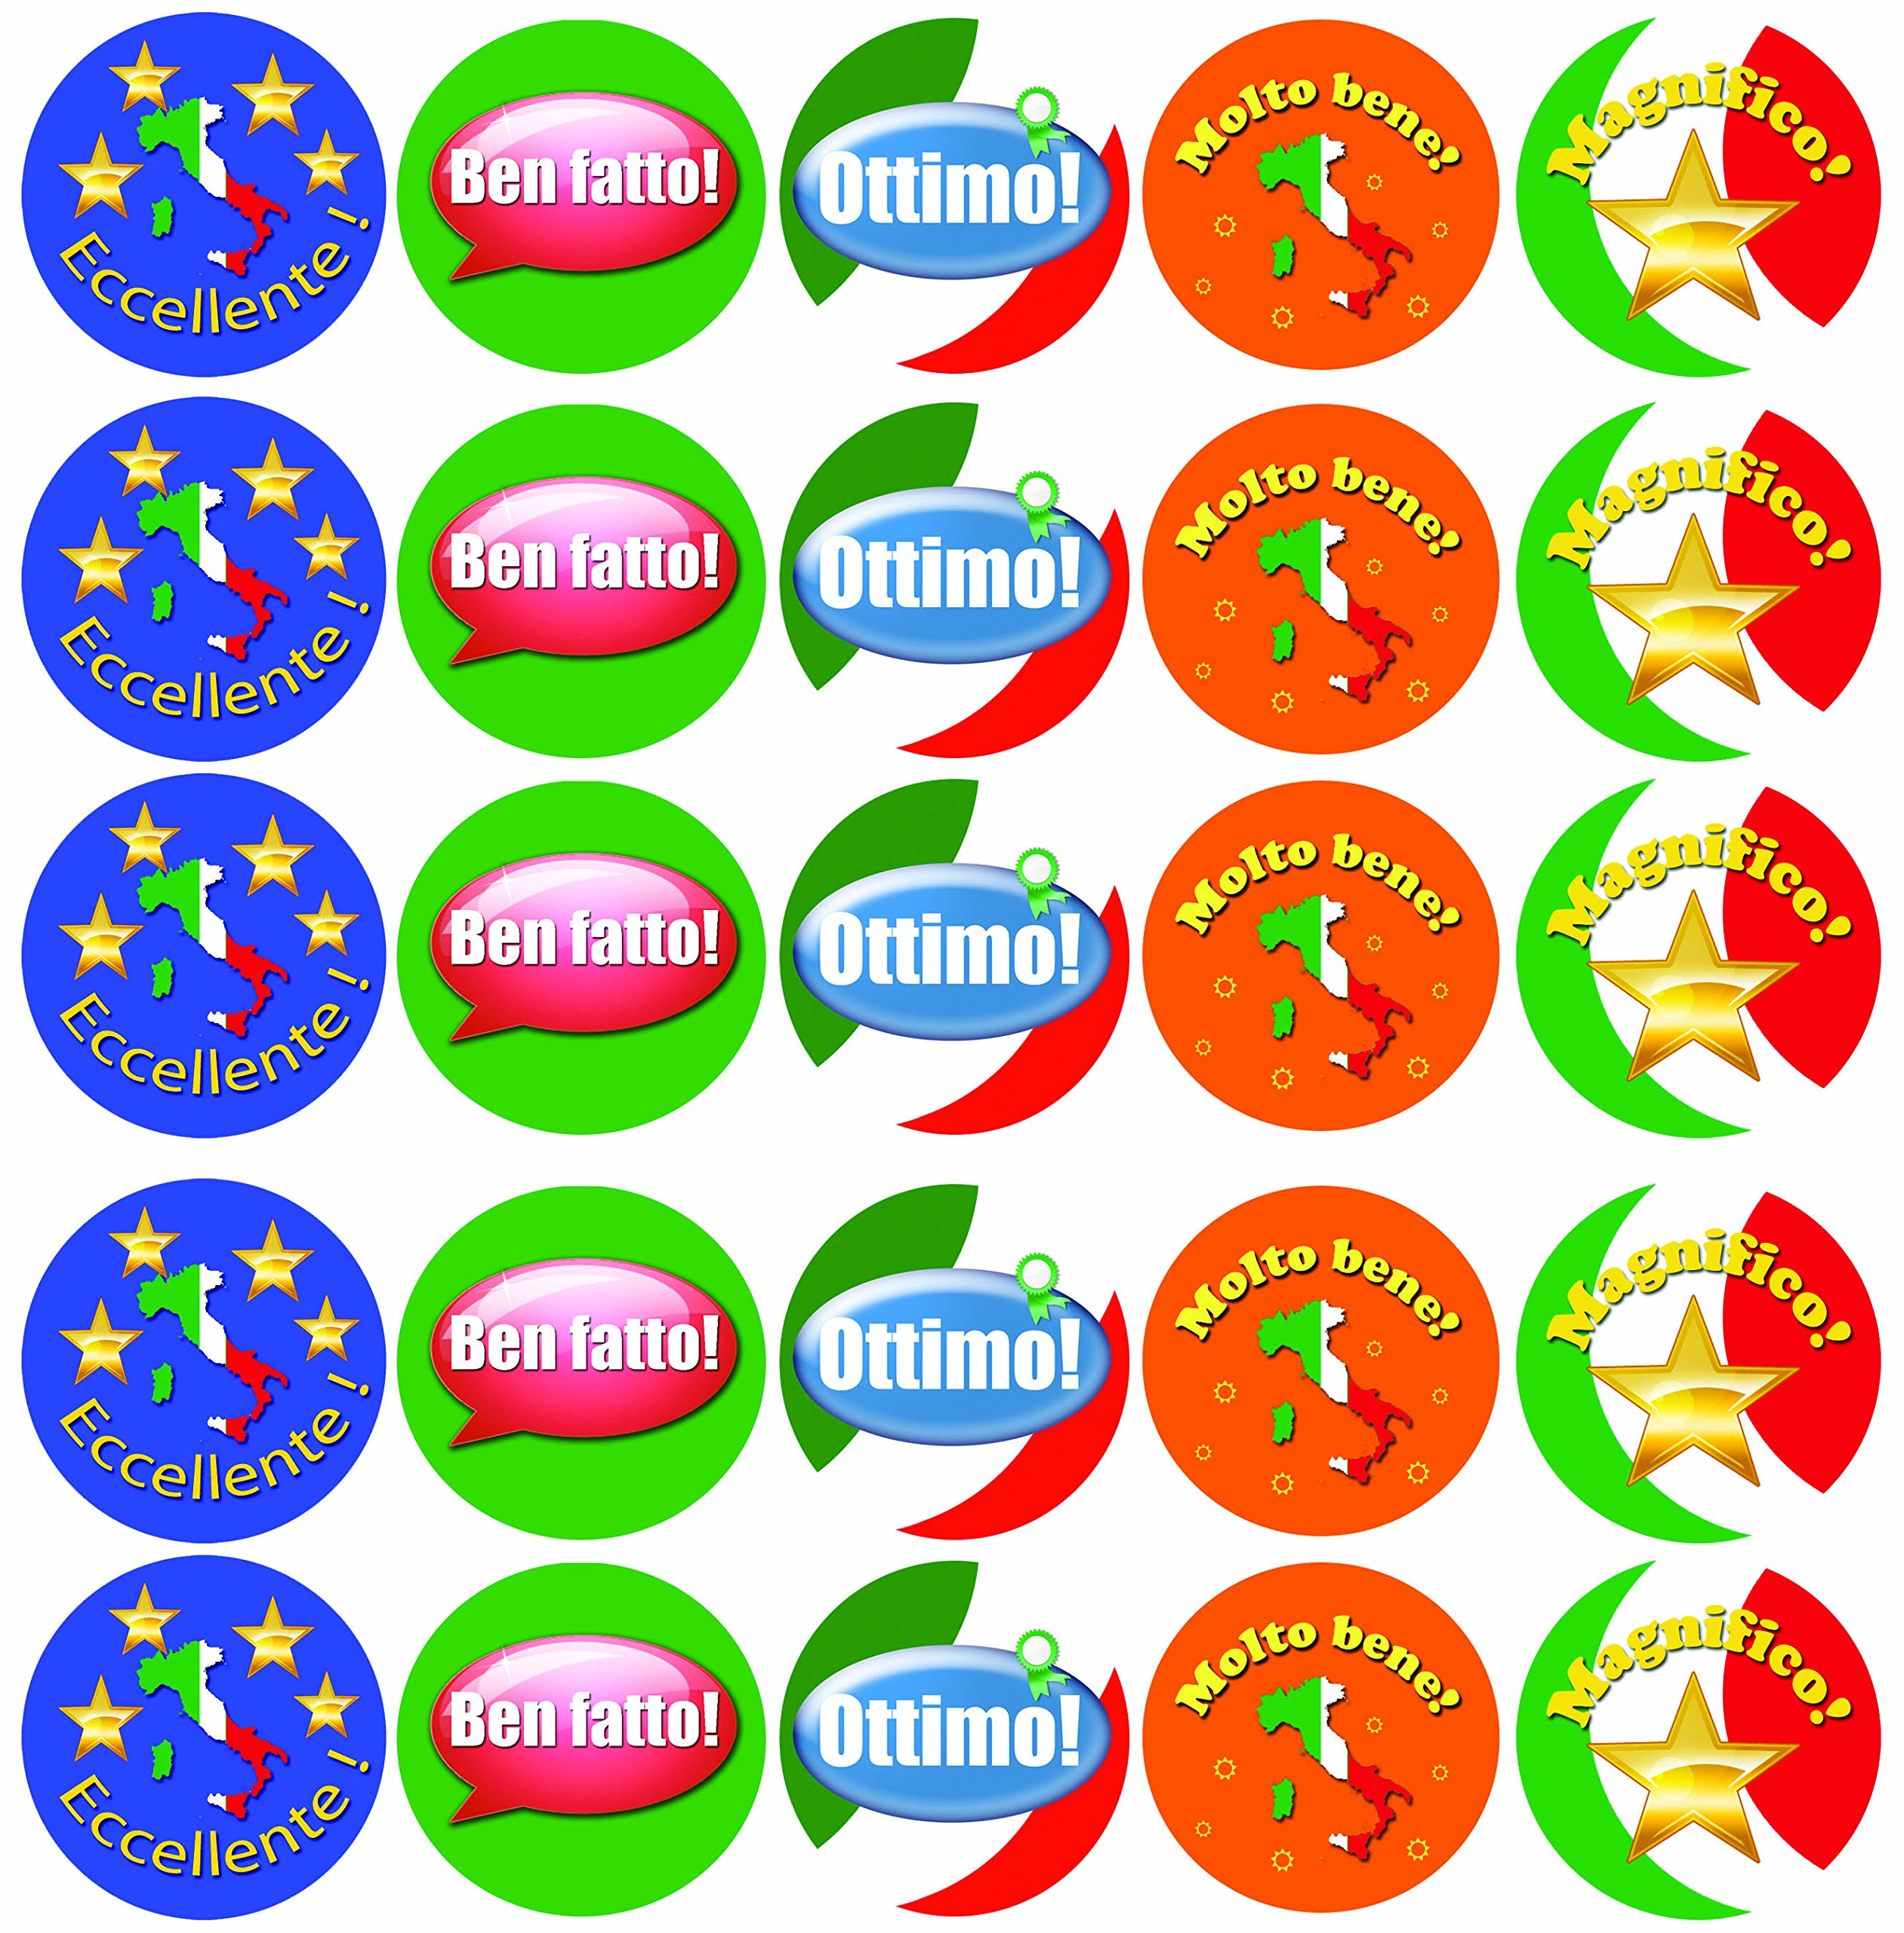 Italian Language Assorted Reward Stickers - Merit Labels for Teachers - Pack of 100